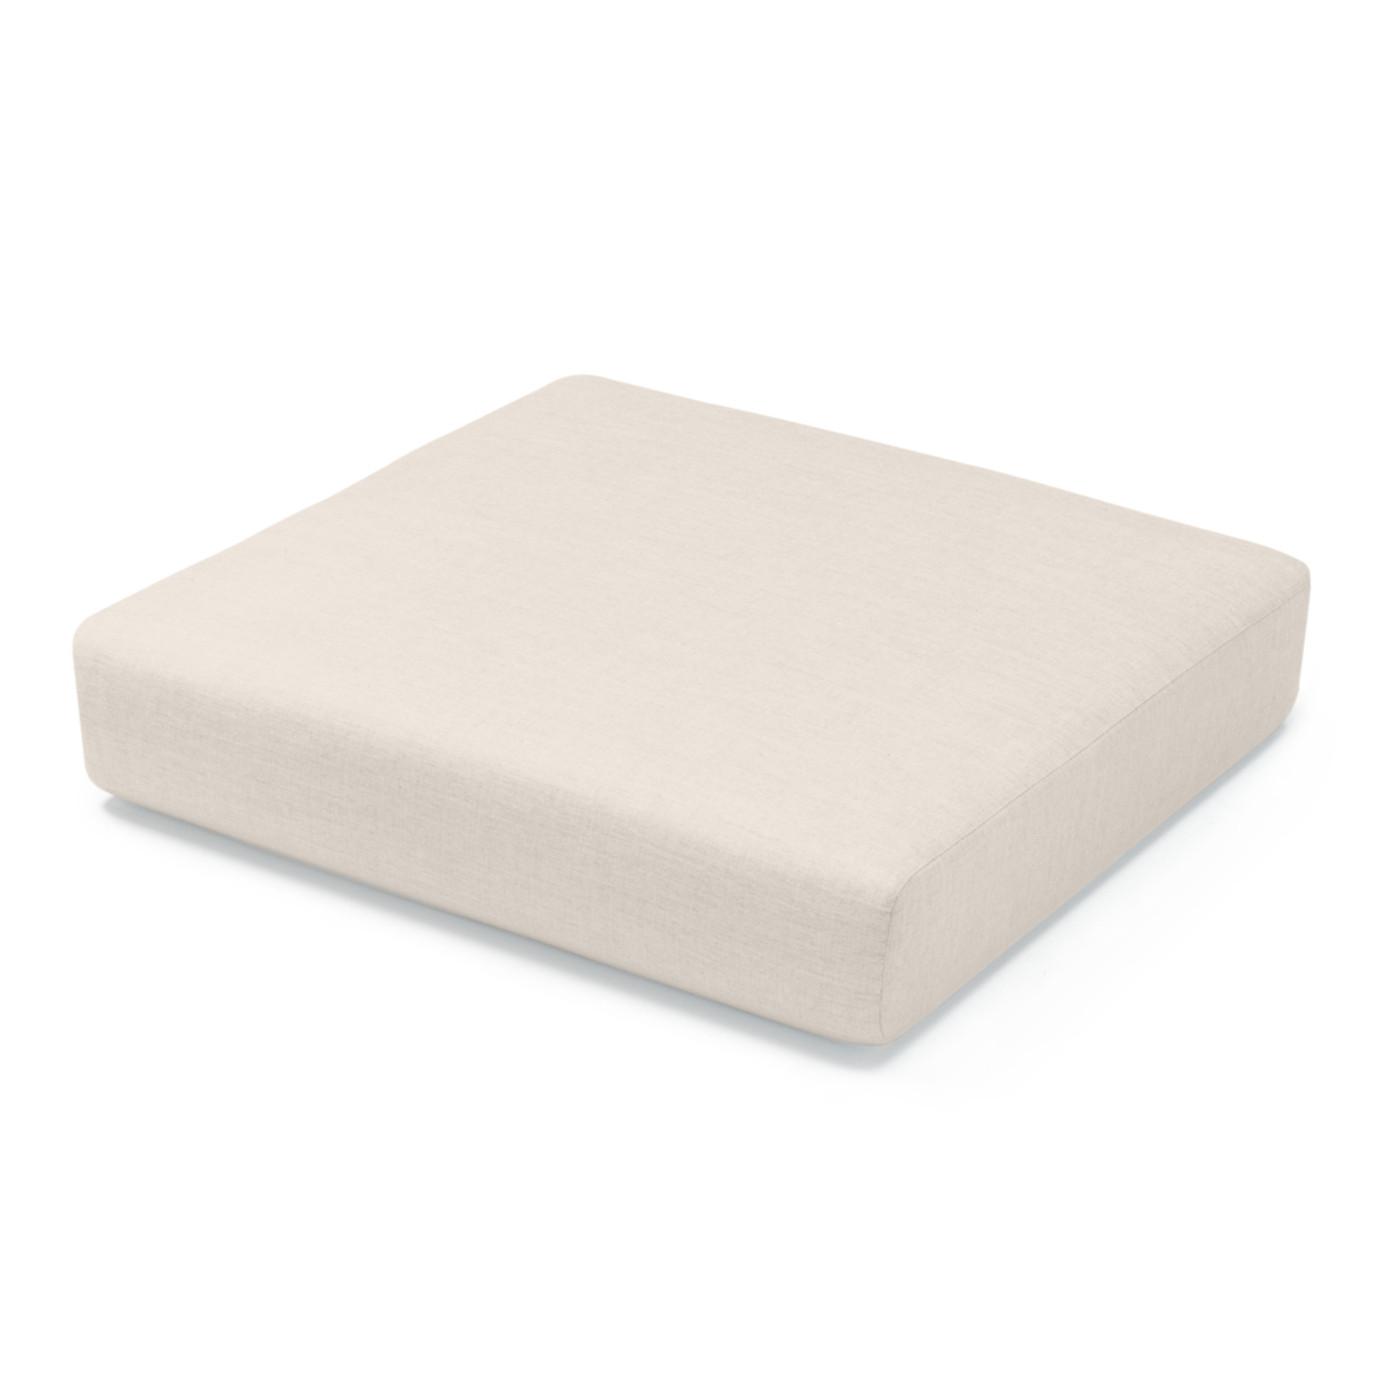 Portofino Sling Corner Chair Base Cushion - Beige Fennel